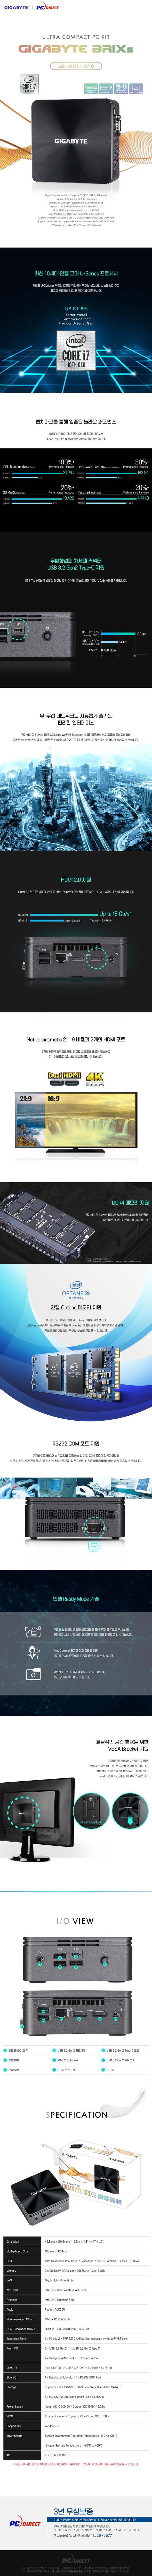 GIGABYTE BRIX GB-BRi7H-10710 M2 피씨디렉트 (16GB, M2 120GB)